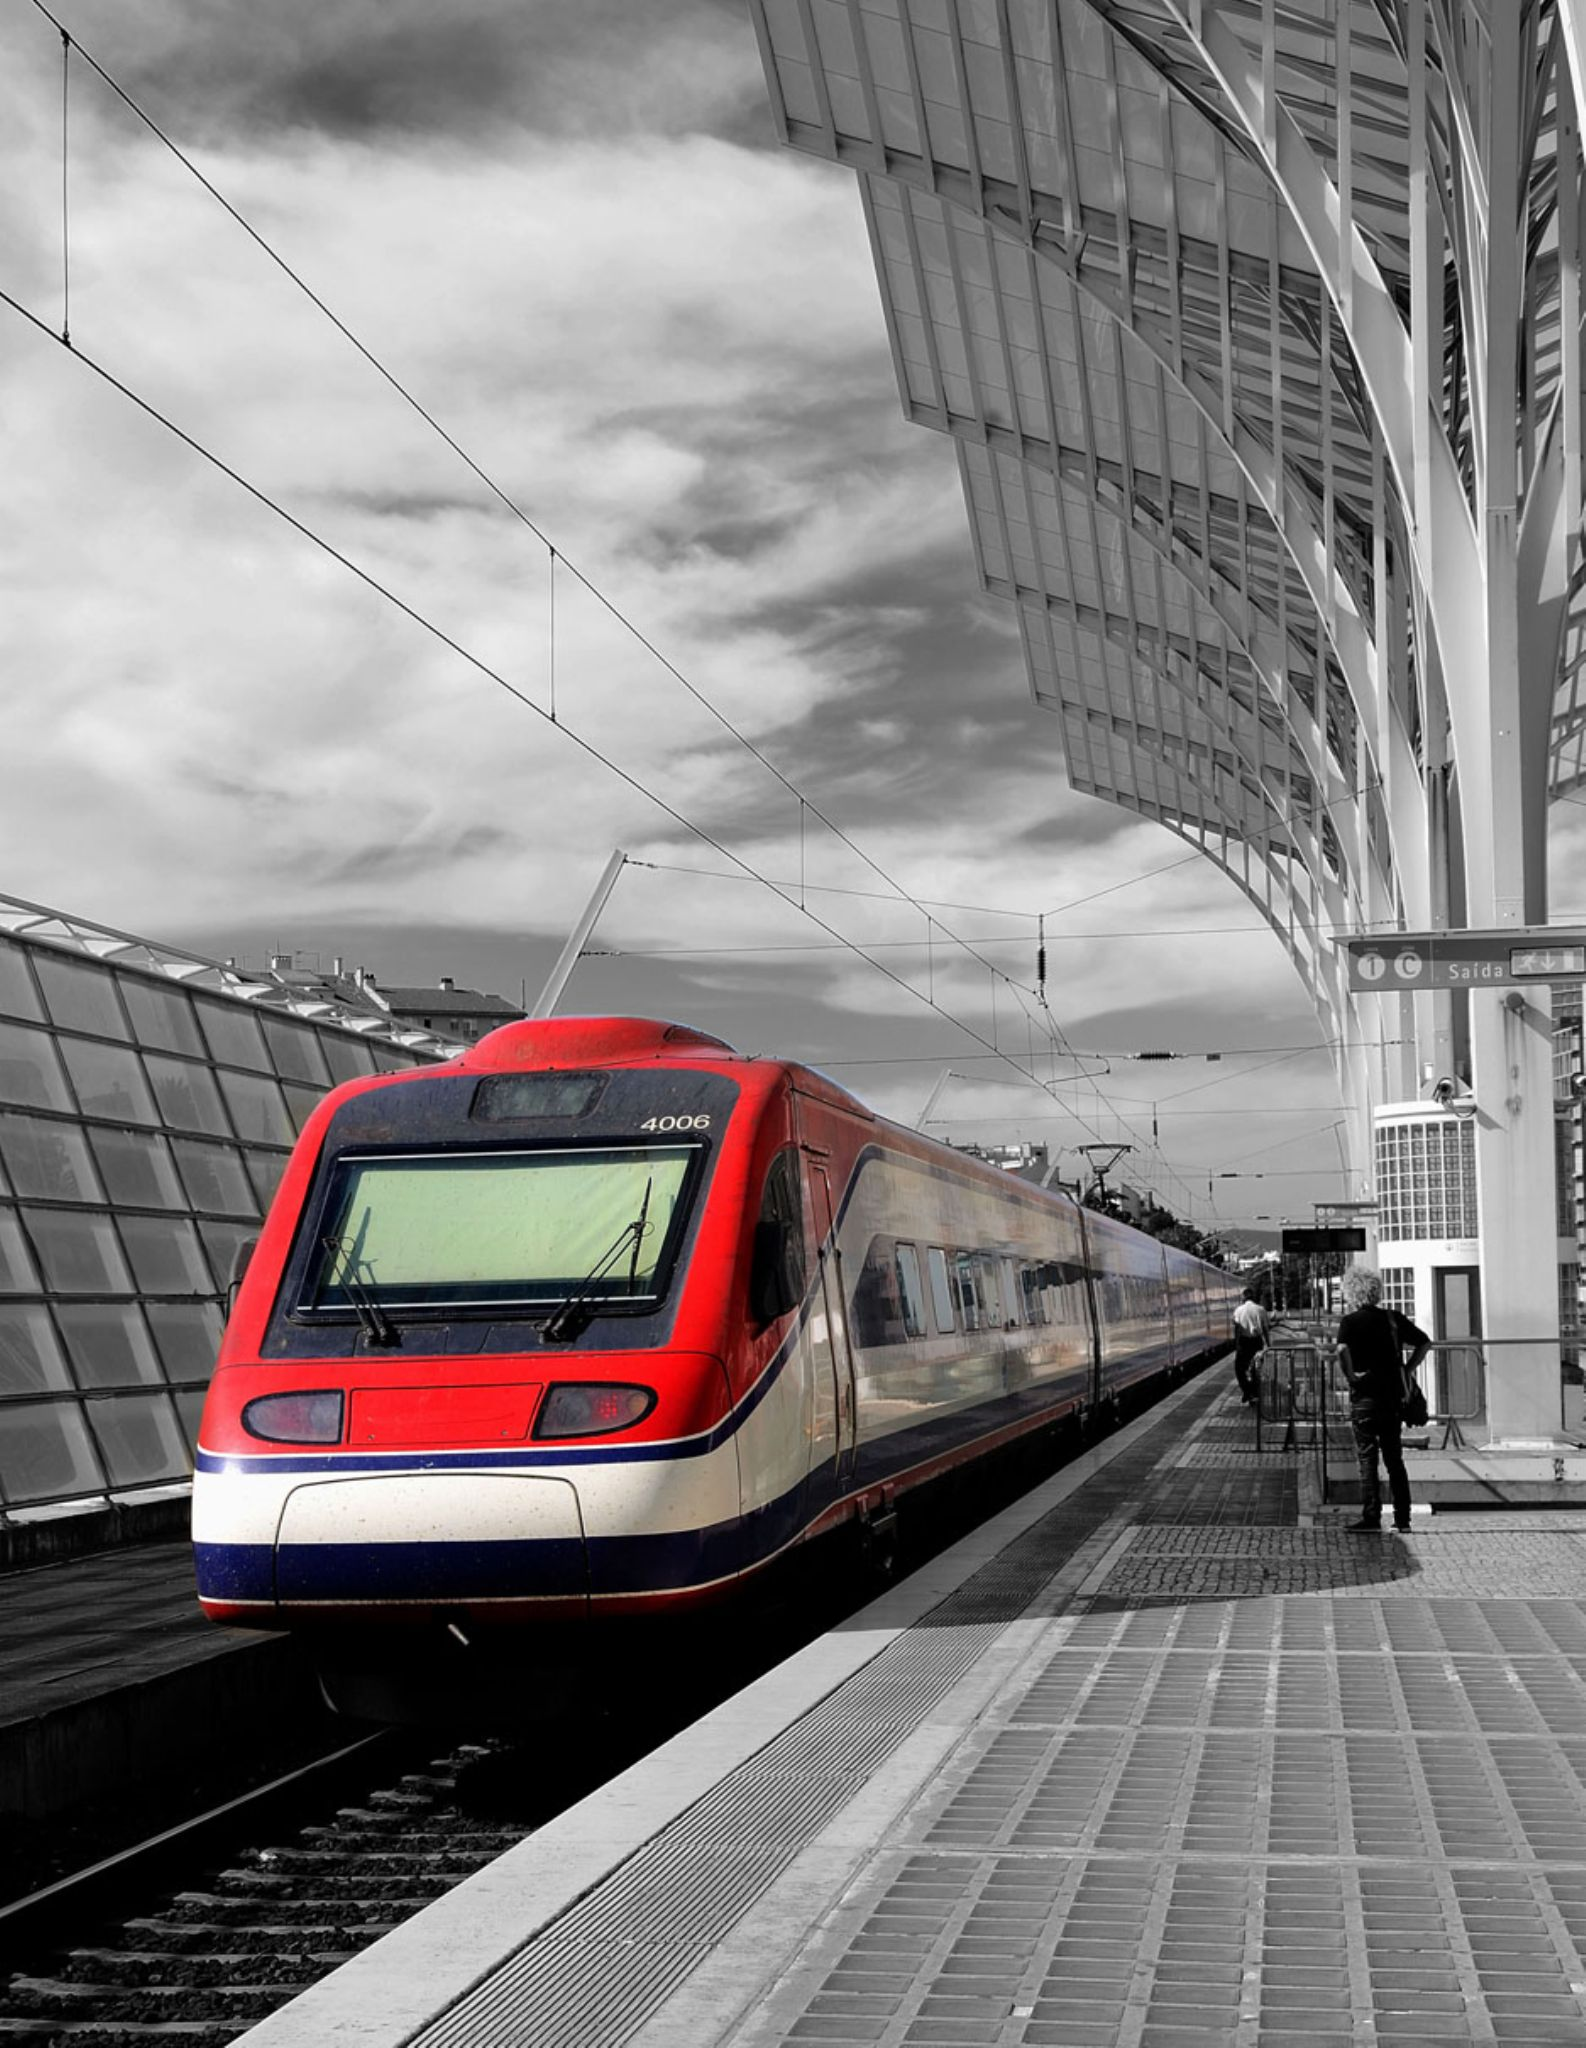 Comboio na Gare by carlosfiuzar